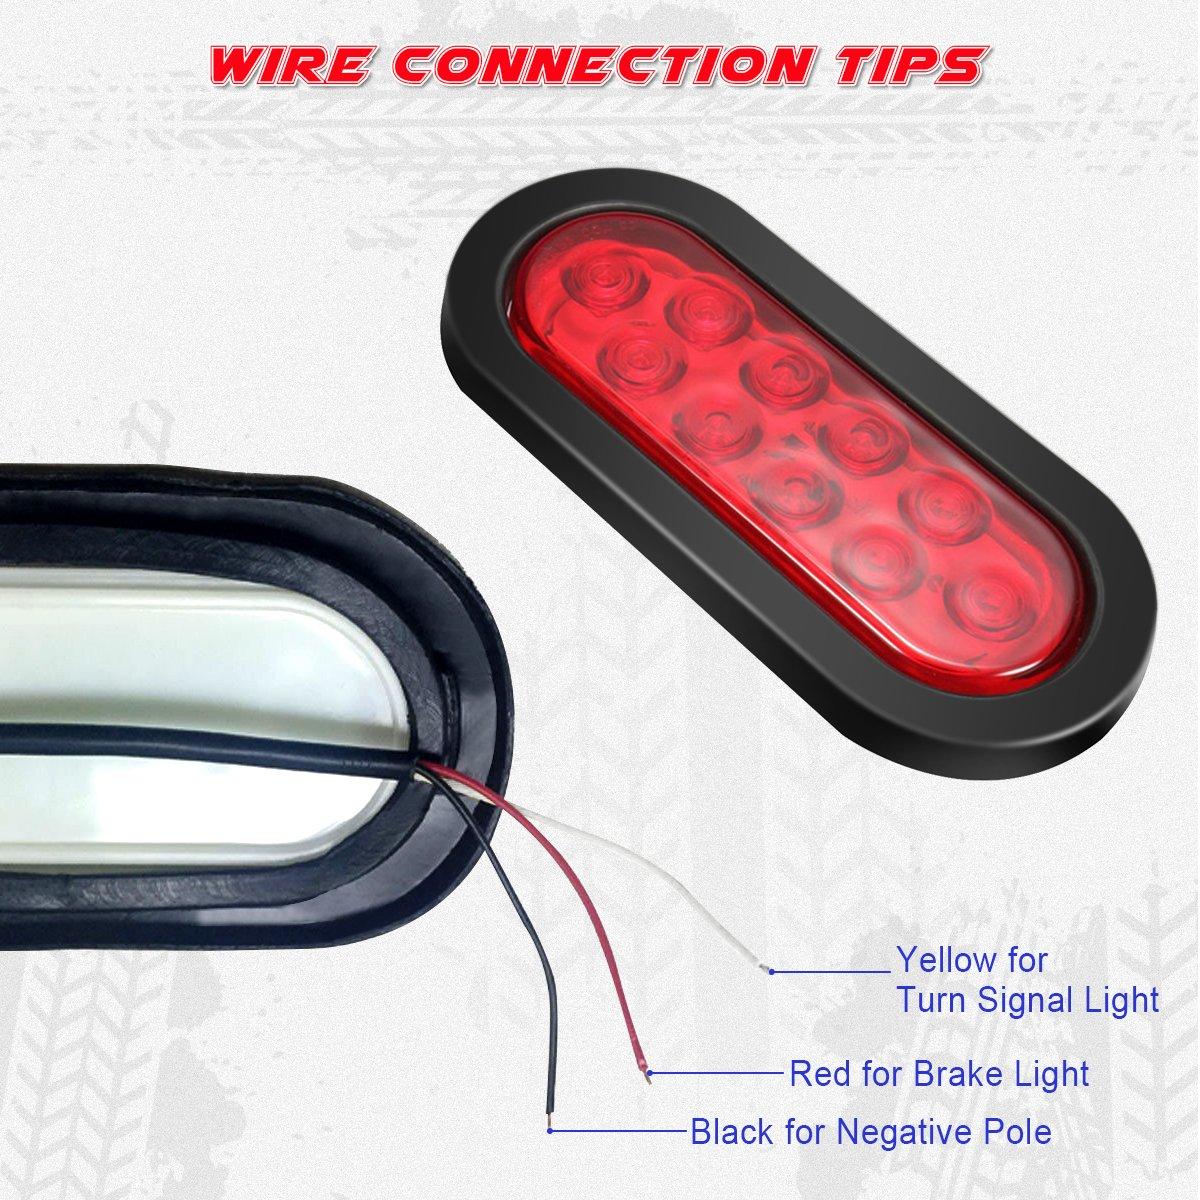 Audew 2Pcs 6-inch Oval LED Trailer Tail Lights Red Brakes//Marker Lights for Truck,Boat,Trailer,Bus,IP65 Waterproof,DC 12V